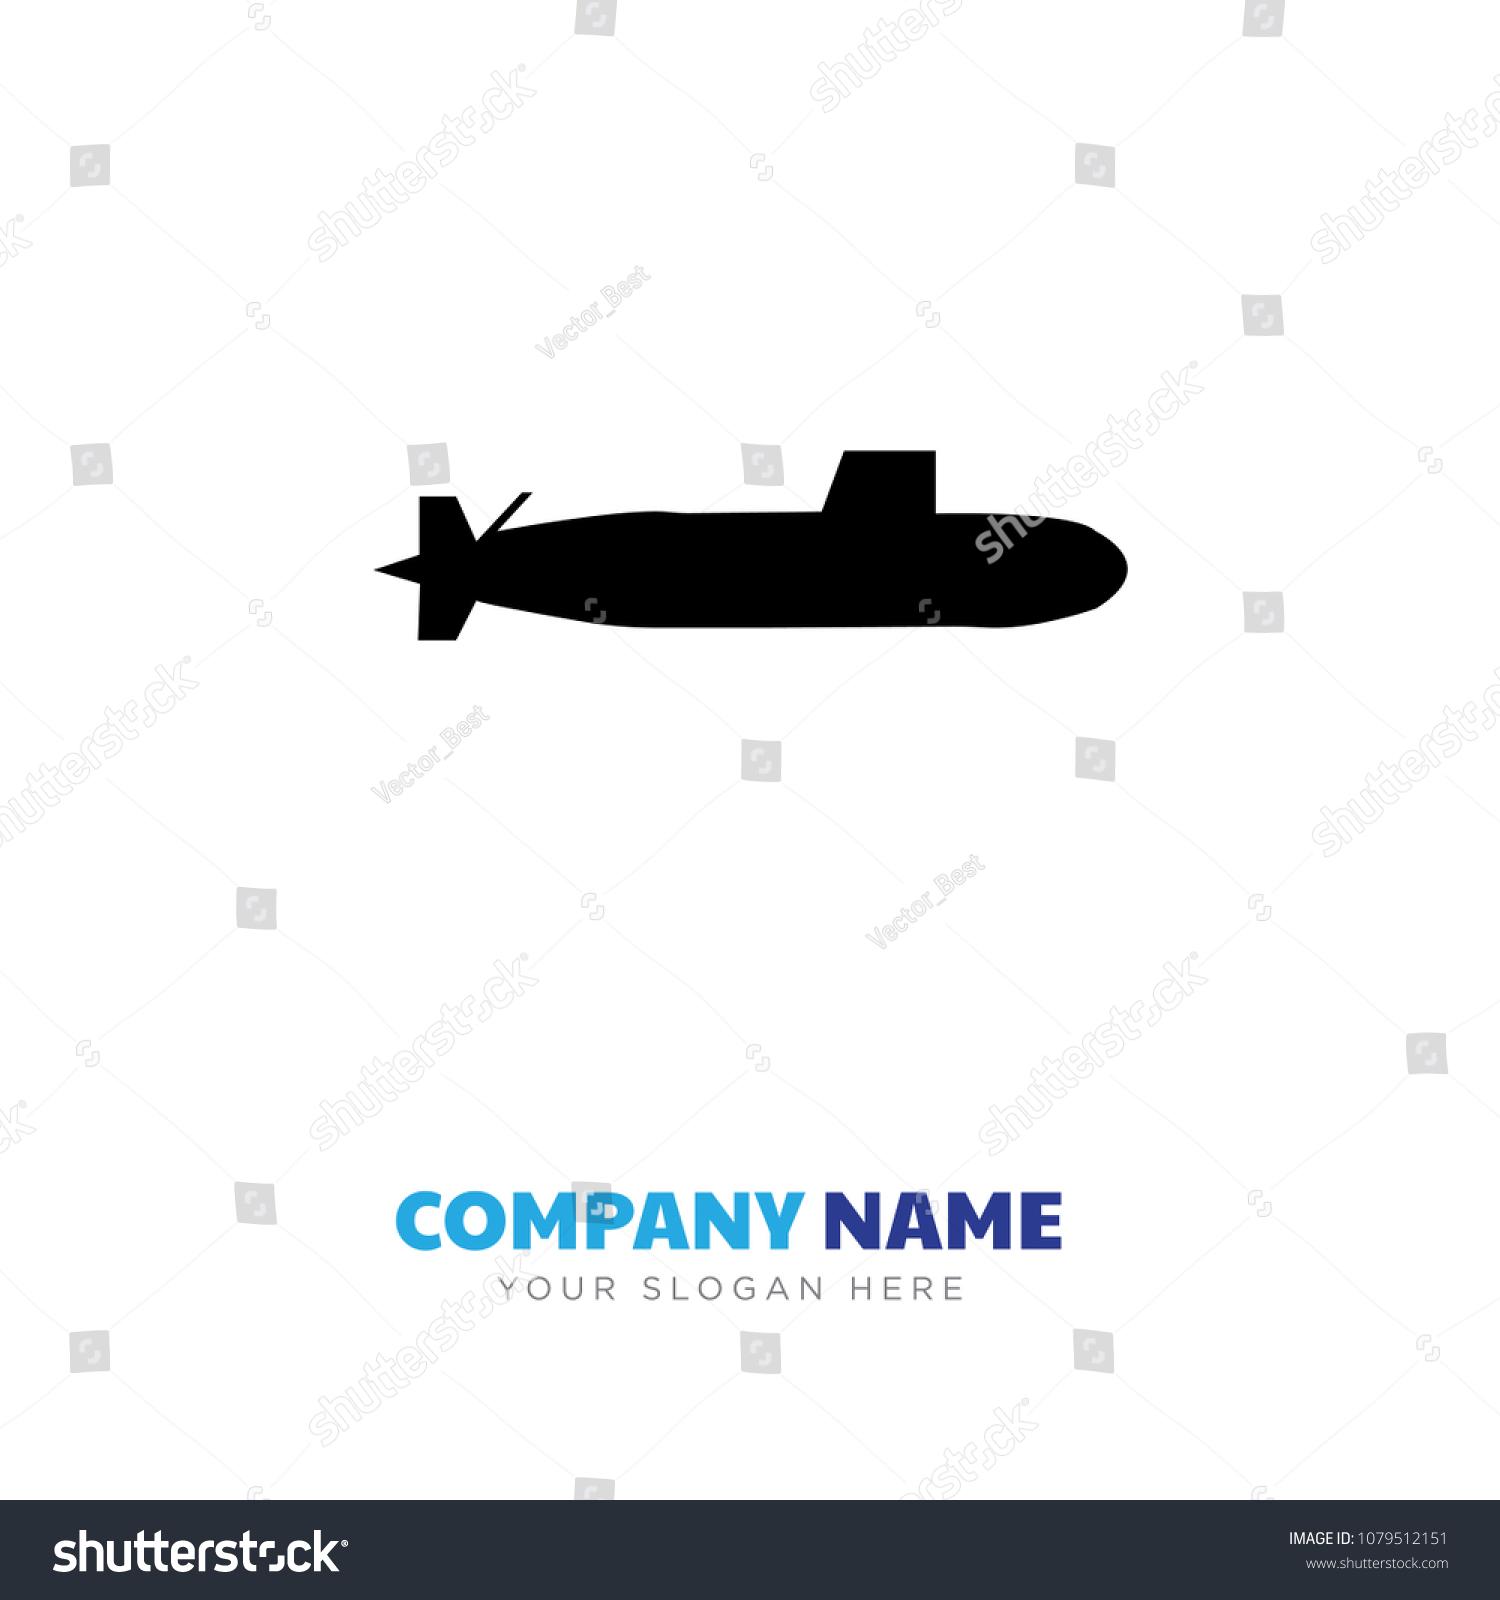 submarine company logo design template business stock vector